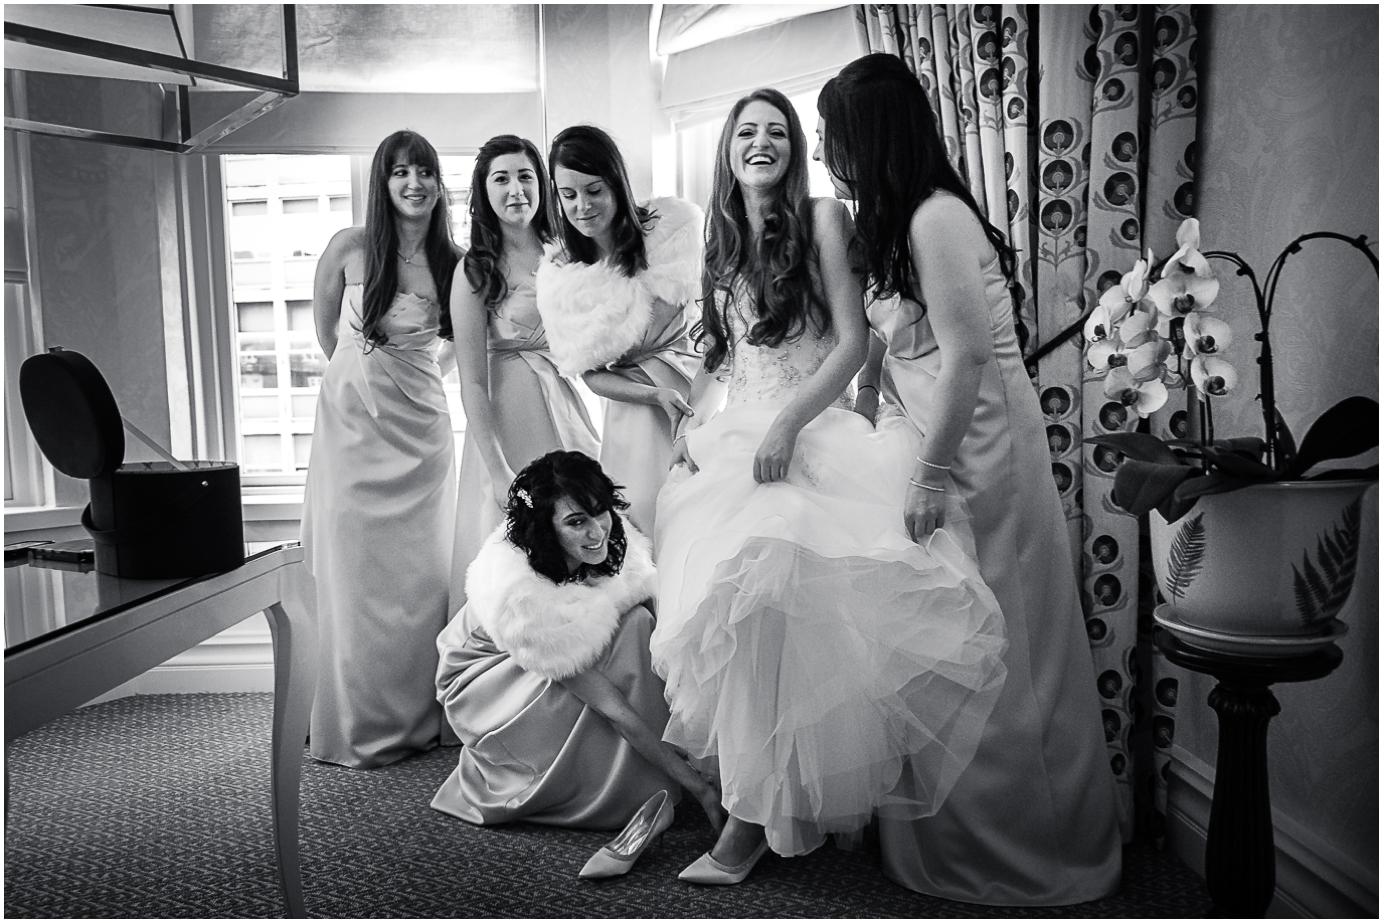 24 - Esmat and Angus - St. Ermin's Hotel London wedding photographer